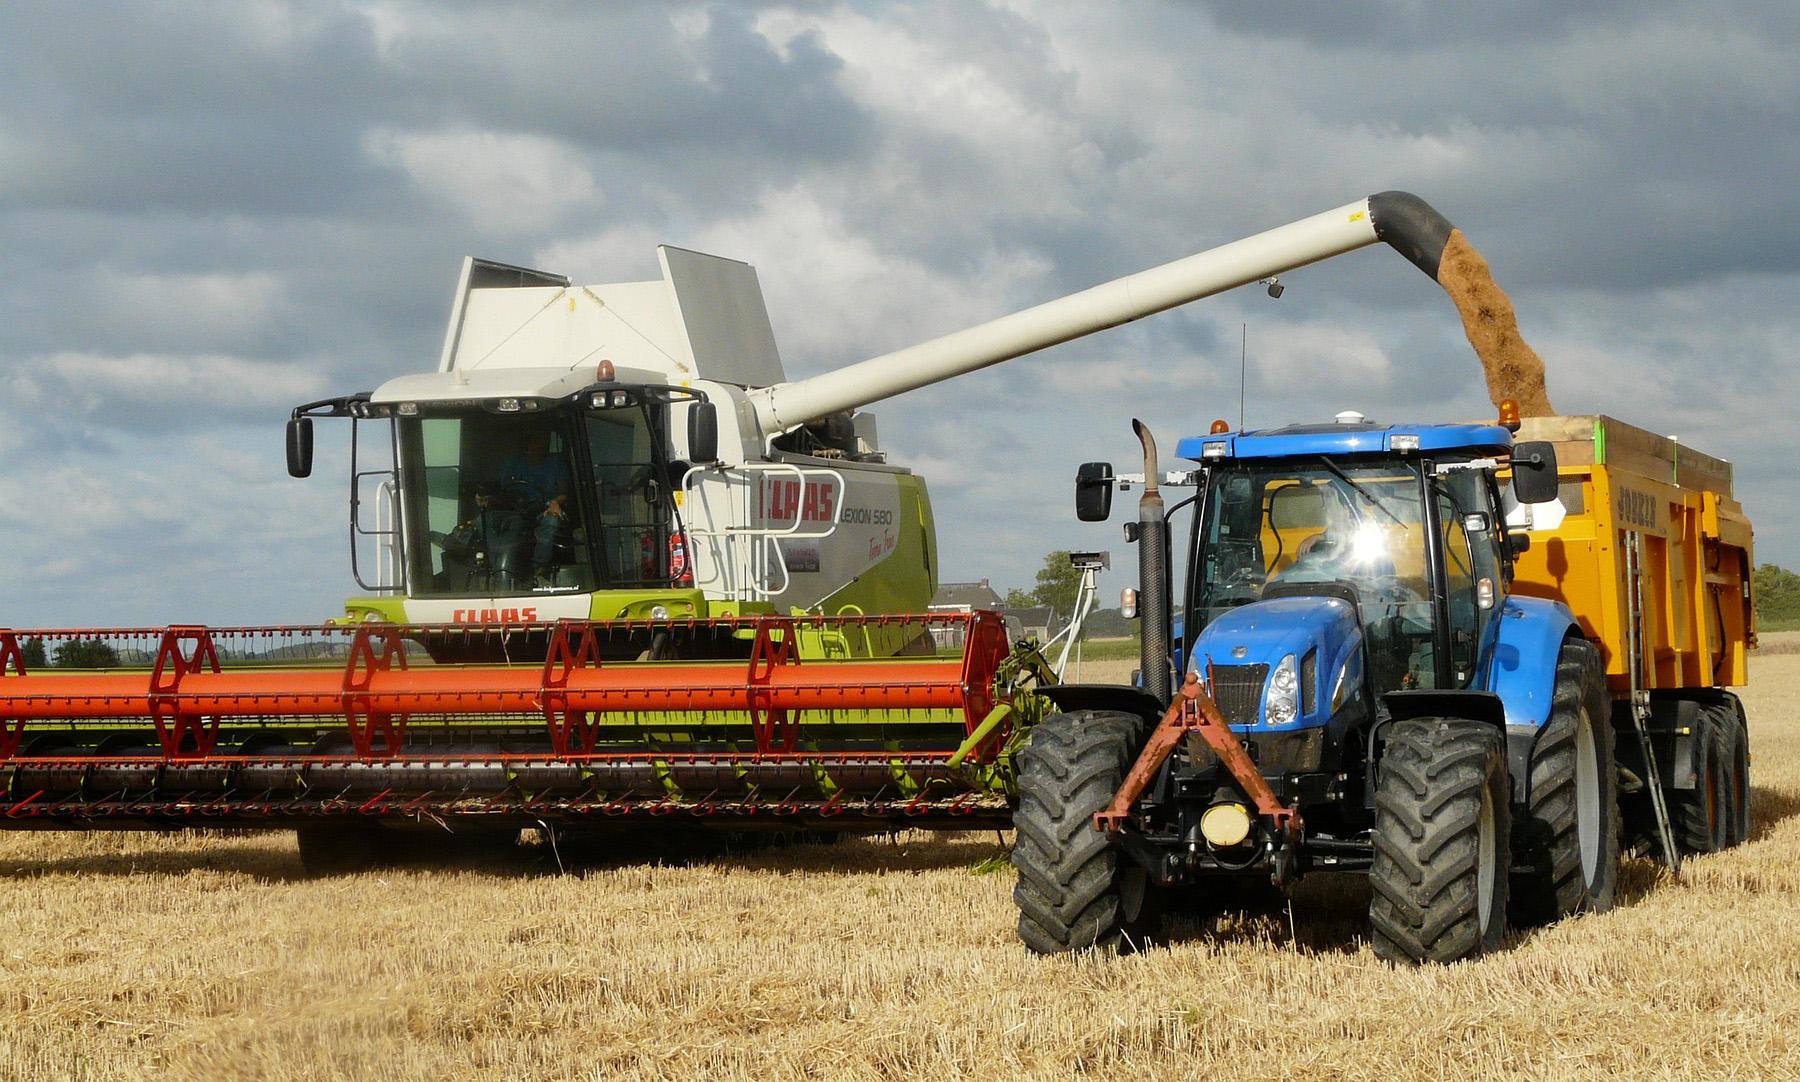 Homologación de vehículos agrícolas